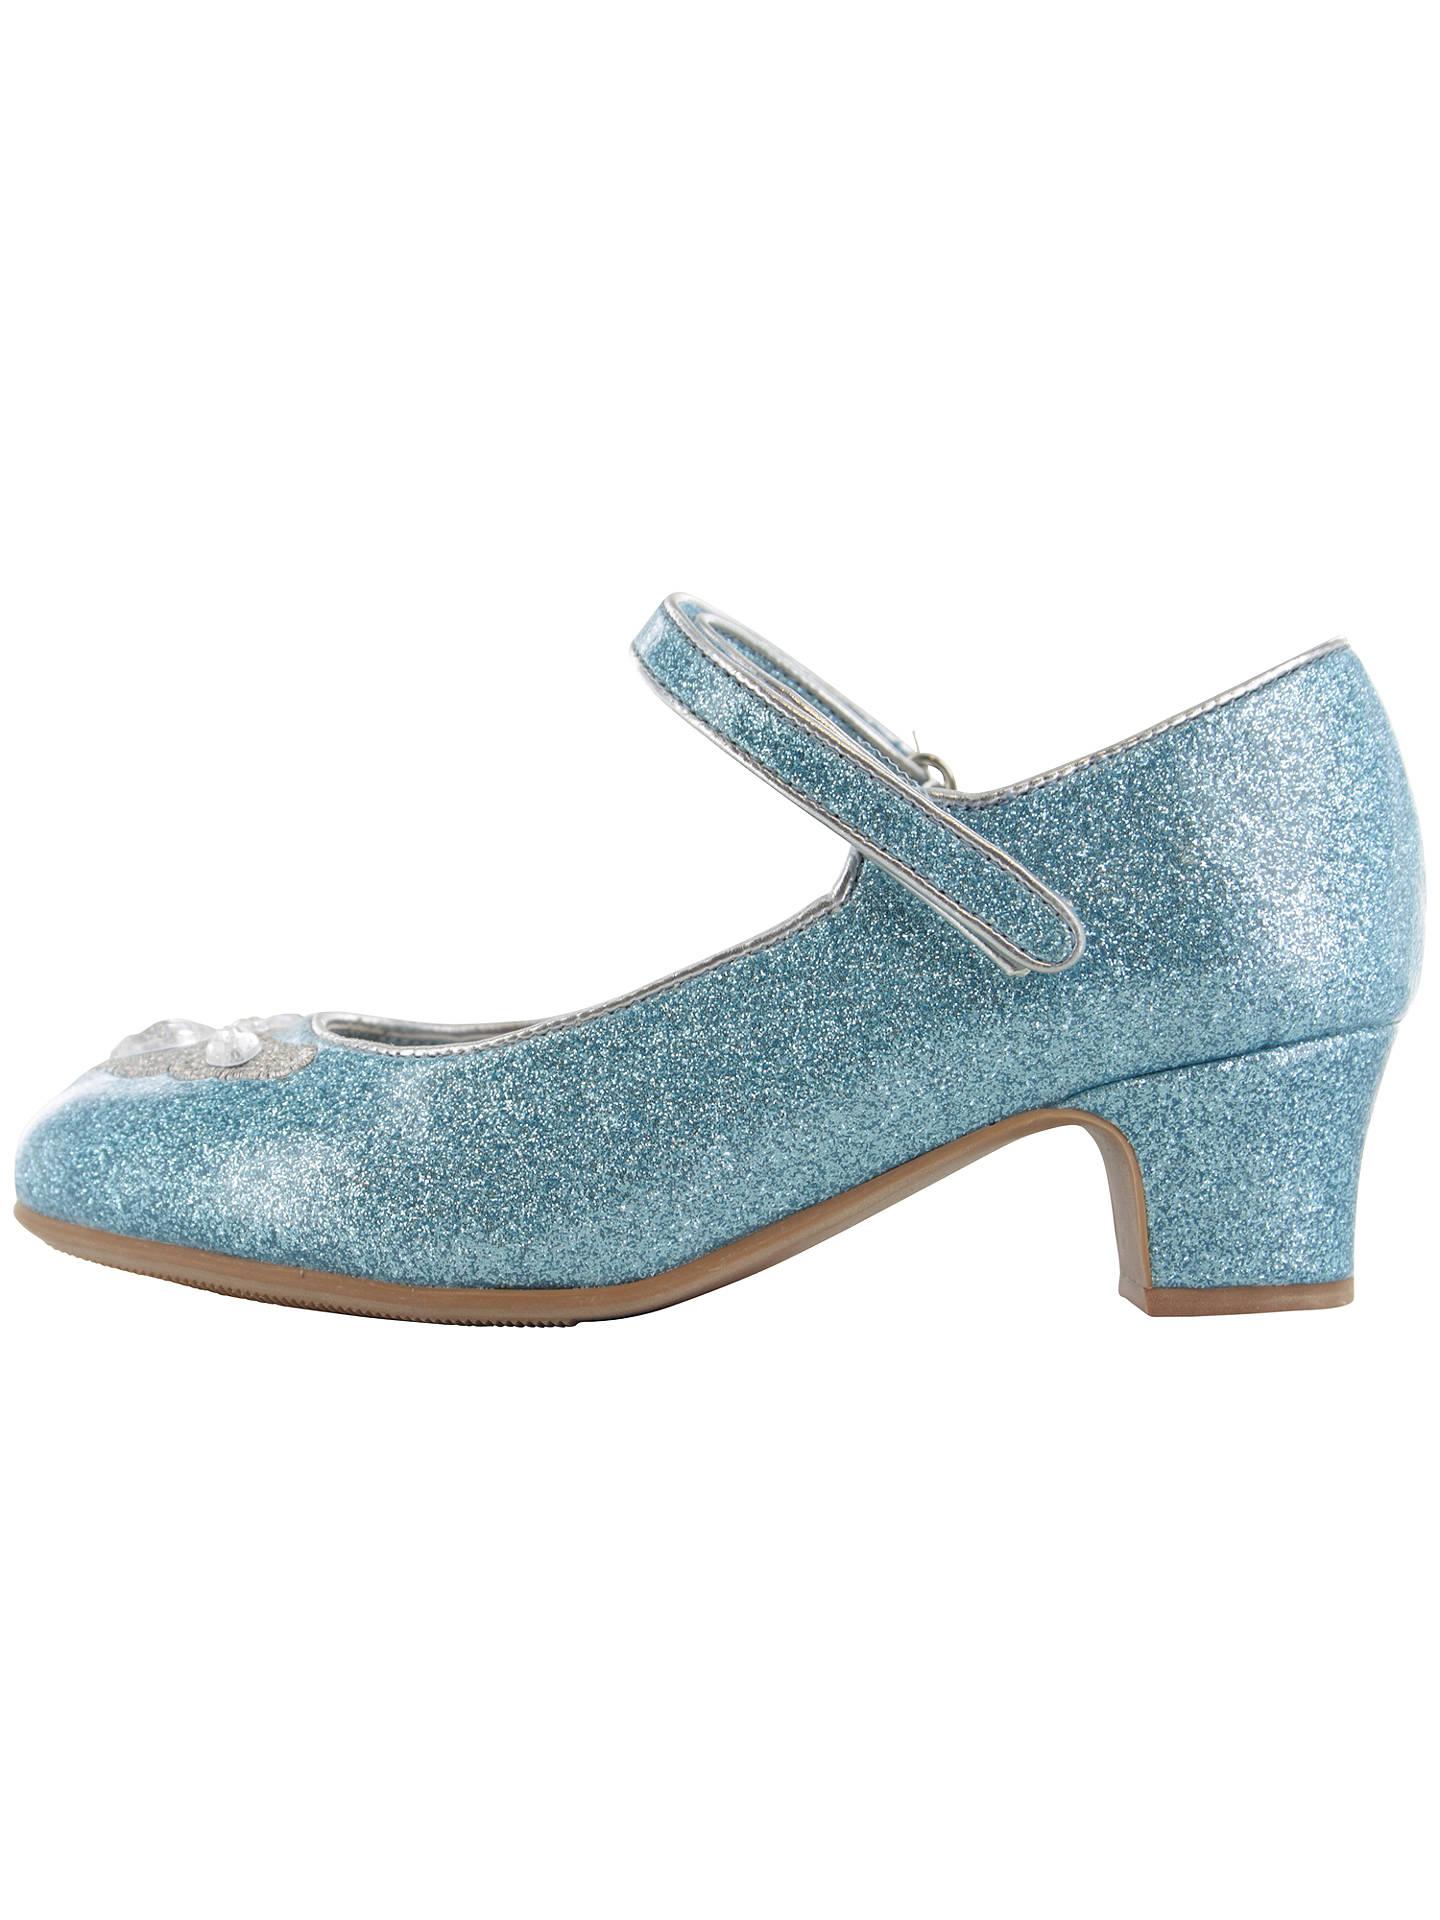 5e742b8c52442 Disney Frozen Elsa & Anna Glitter Shoes, Blue at John Lewis & Partners